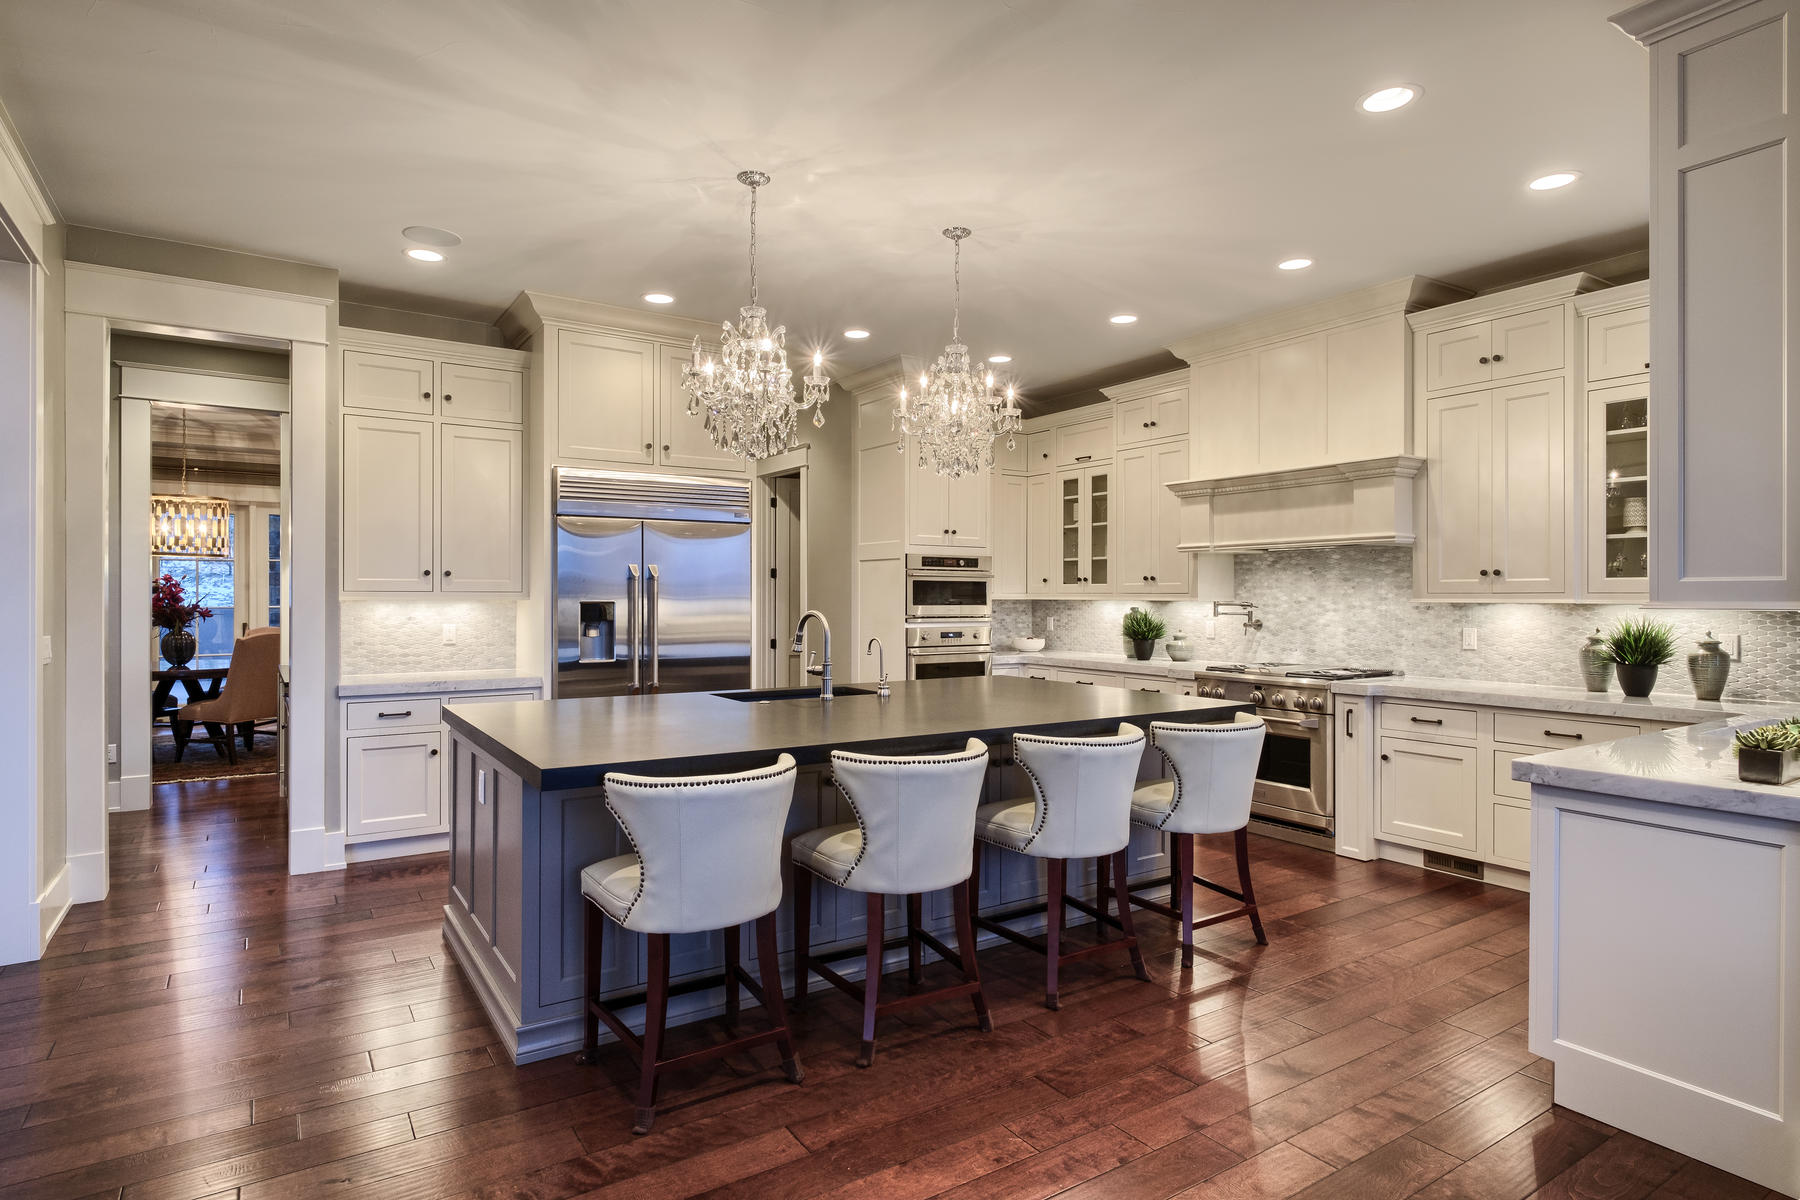 Casa para uma família para Venda às Perched high on a beautiful half acre lot 10815 Wintersong Way Highlands Ranch, Colorado, 80126 Estados Unidos